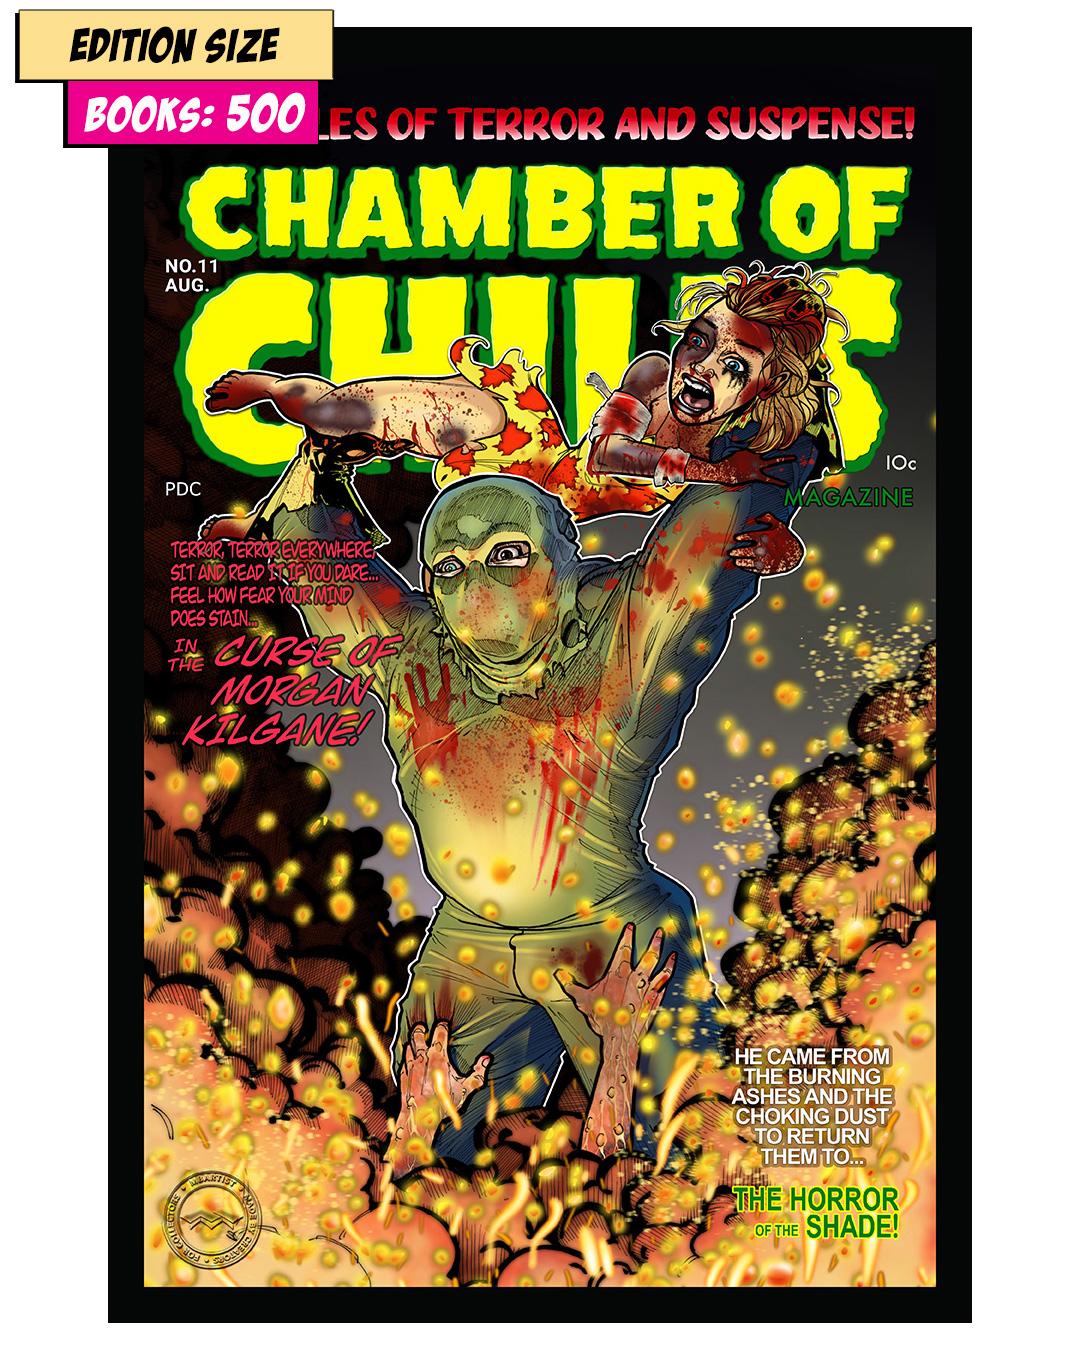 Book - CHAMBER OF CHILLS #11 : REPRINT